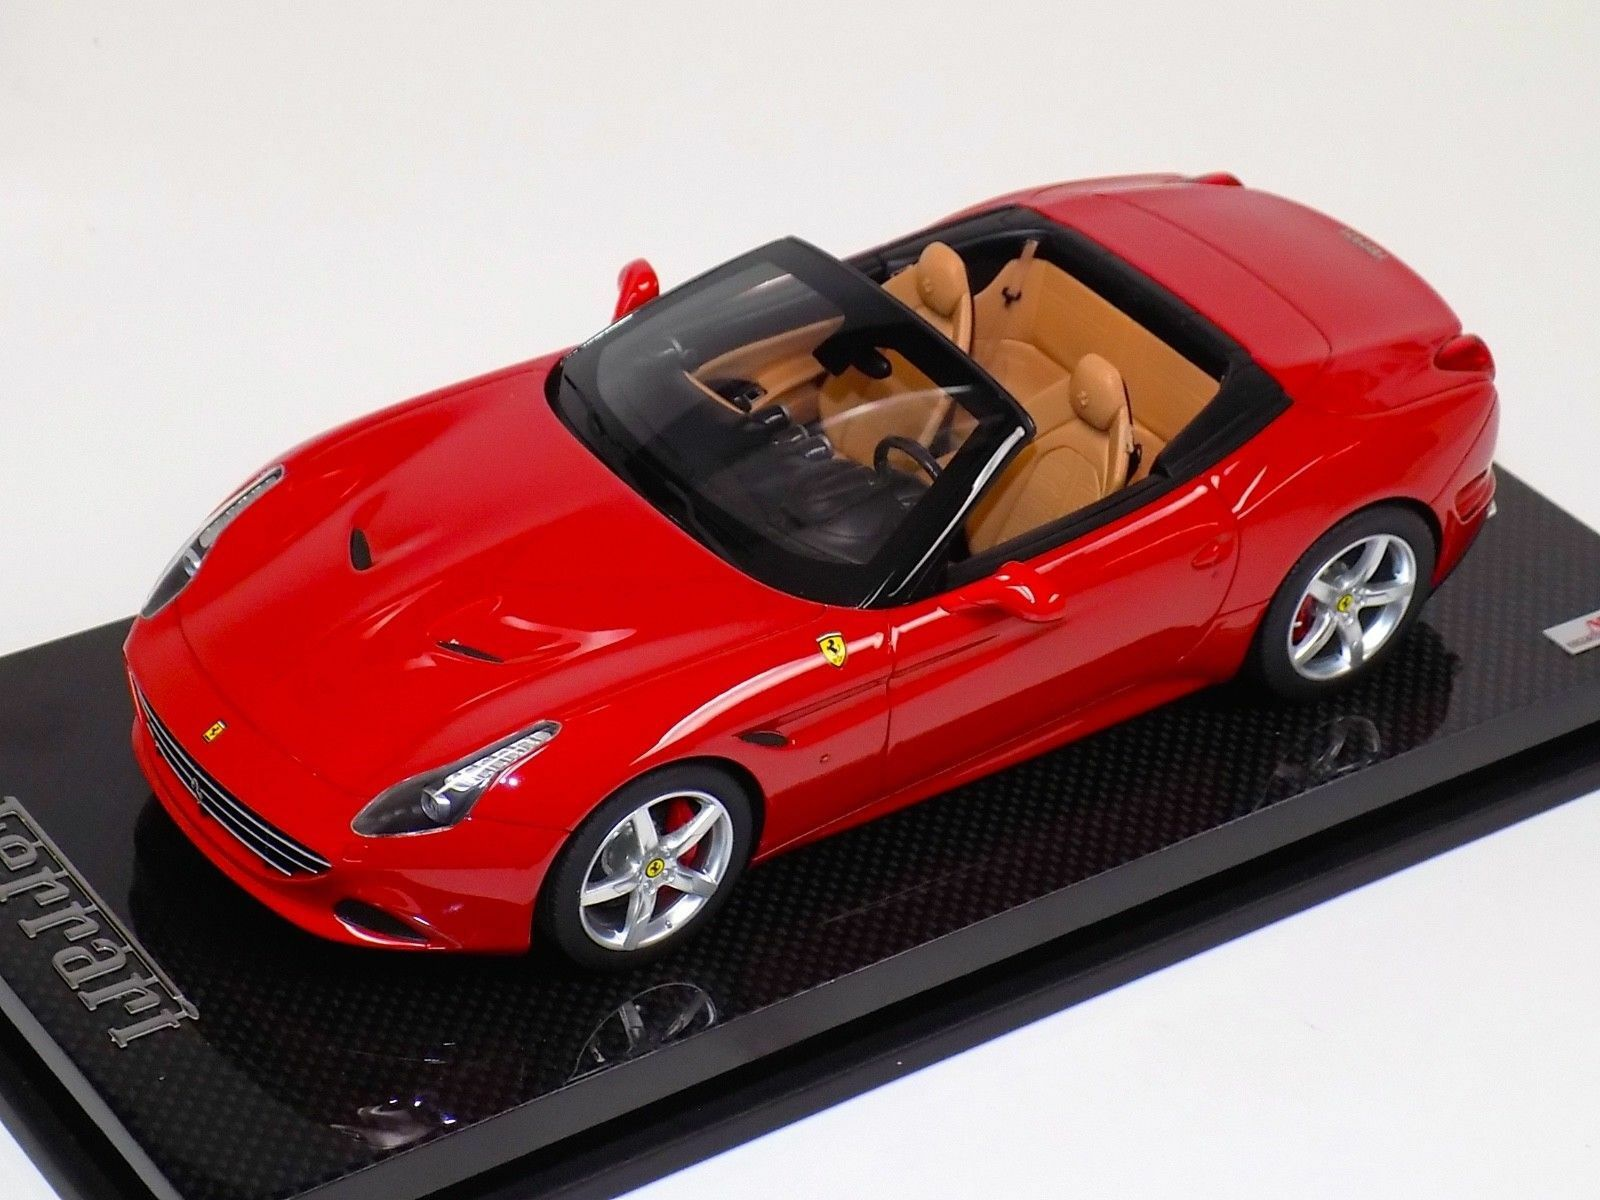 1 18 MR Collection Ferrari California T open top red Corsa Carbon Base